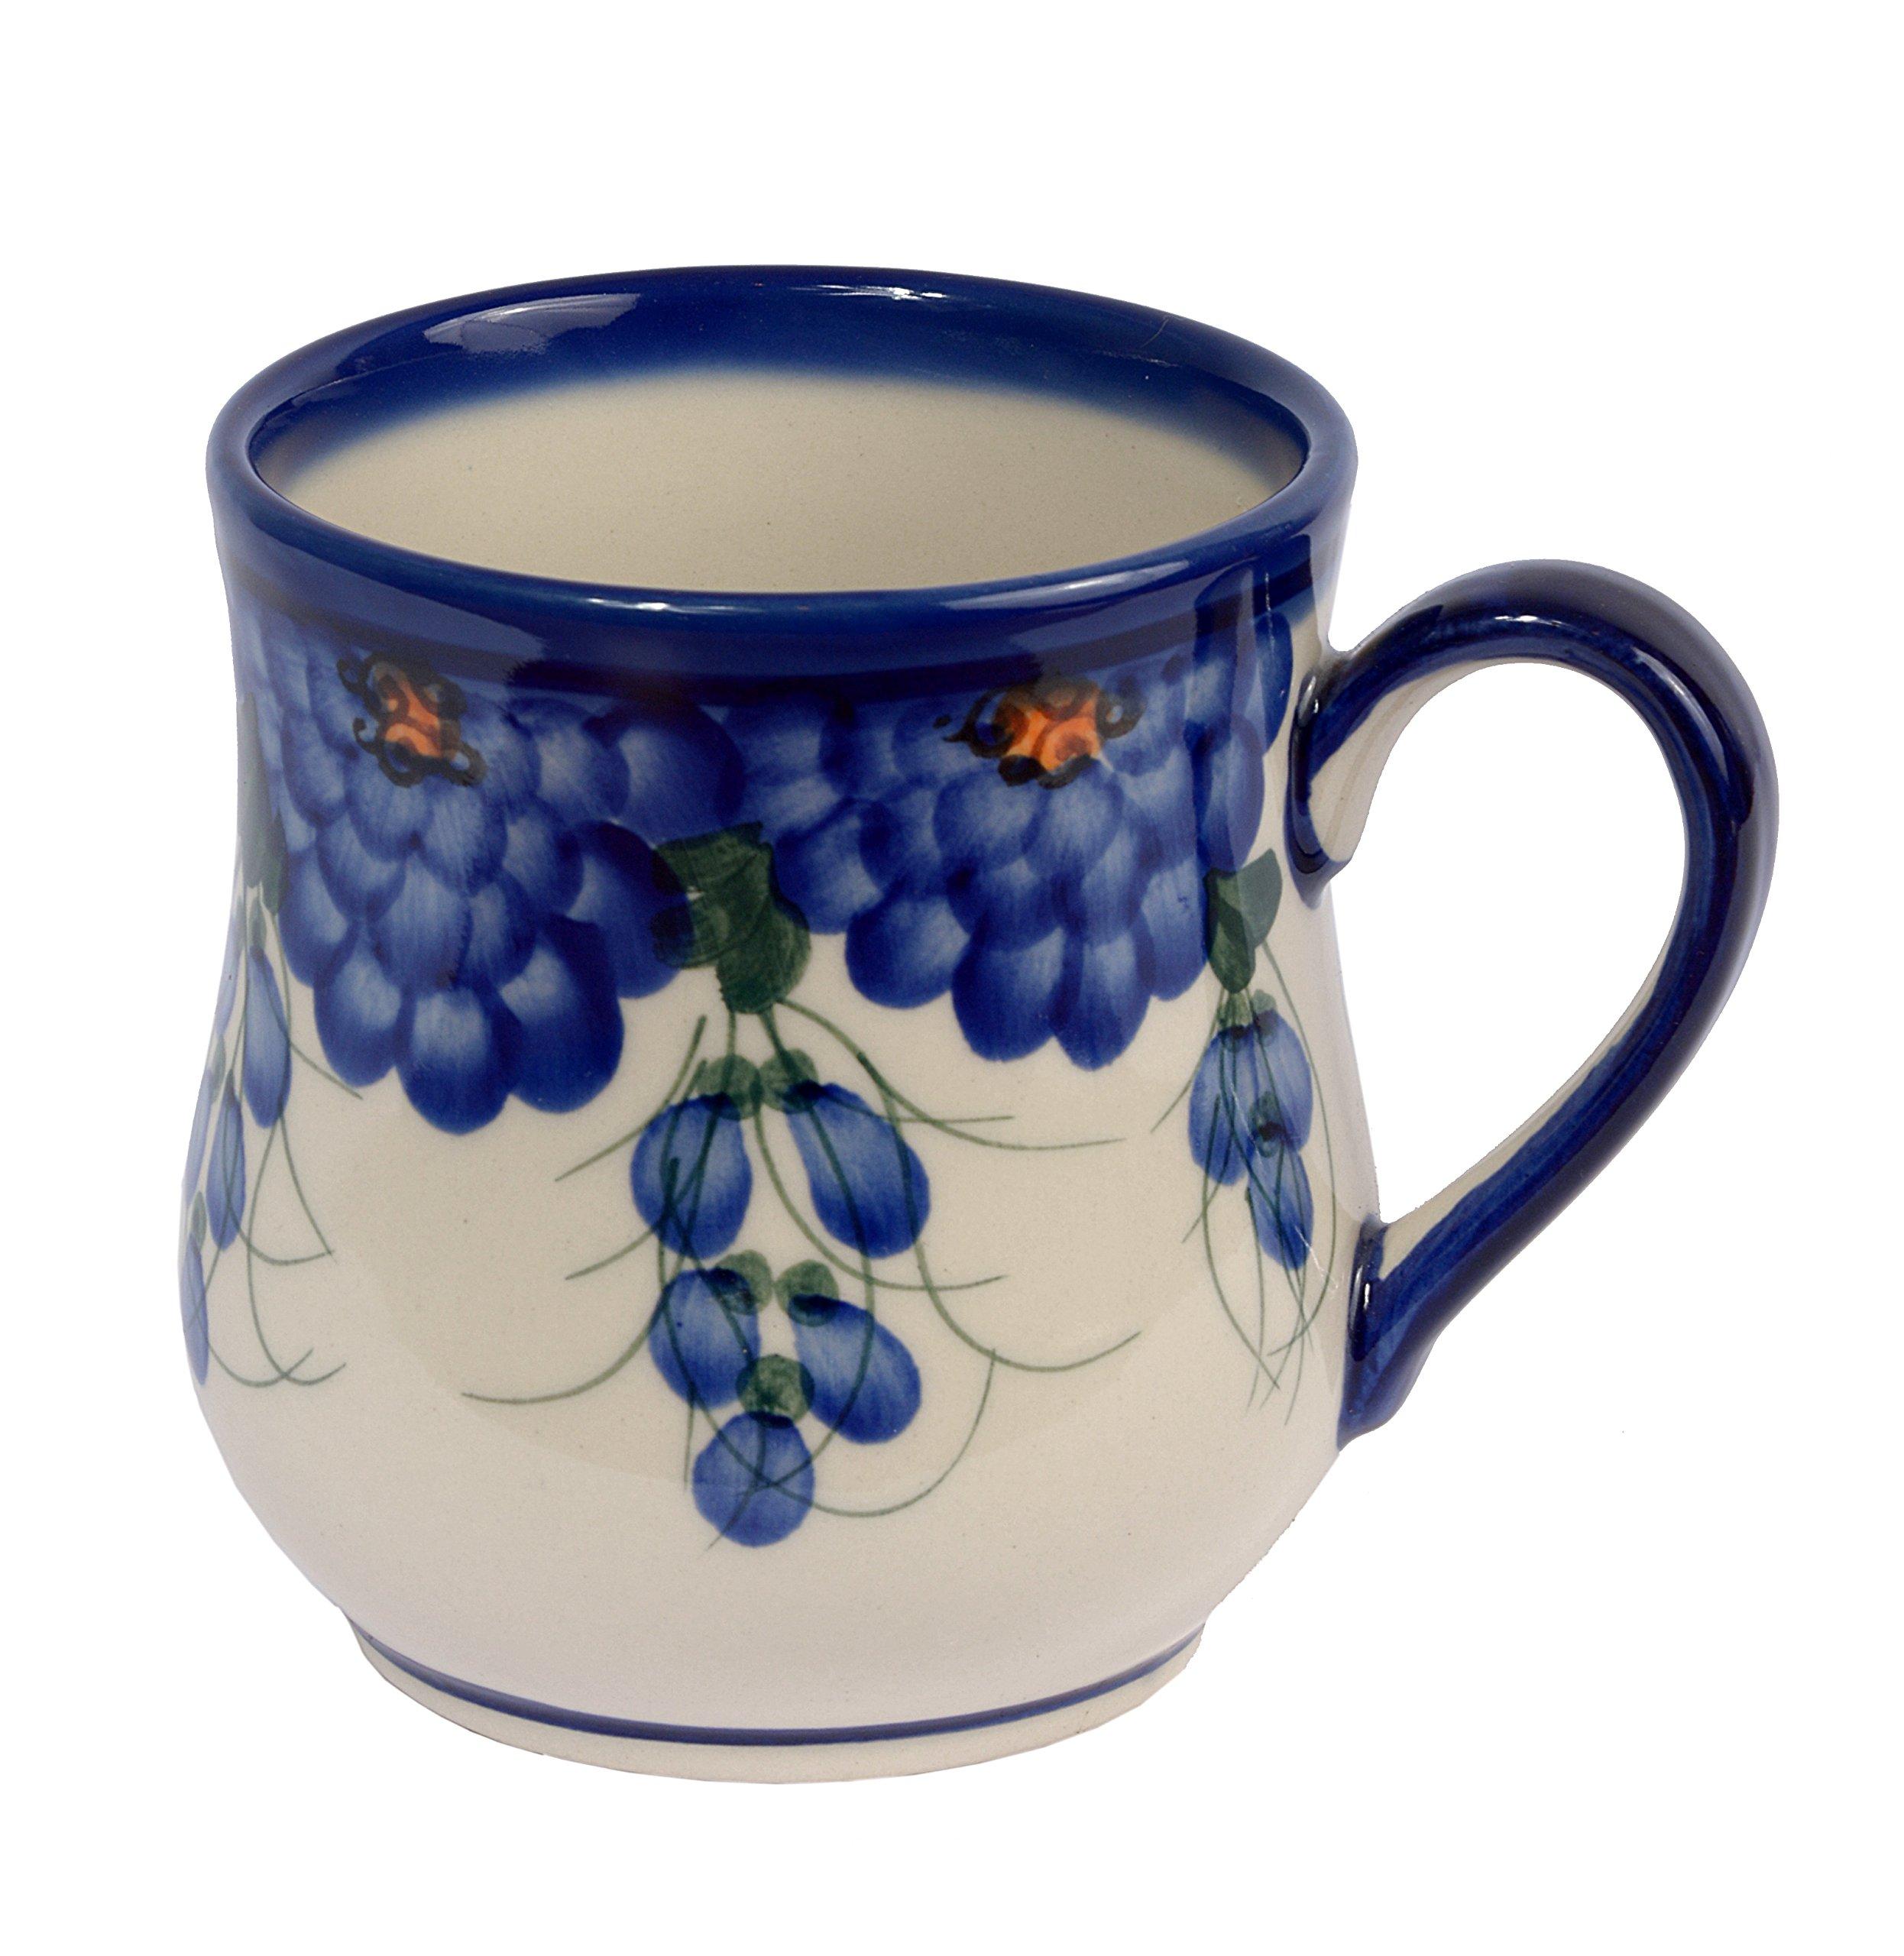 Traditional Polish Pottery, Handcrafted Ceramic Drop-shaped Mug (350 ml /12.3 fl oz), Boleslawiec Style Pattern, Q.102.ARTS